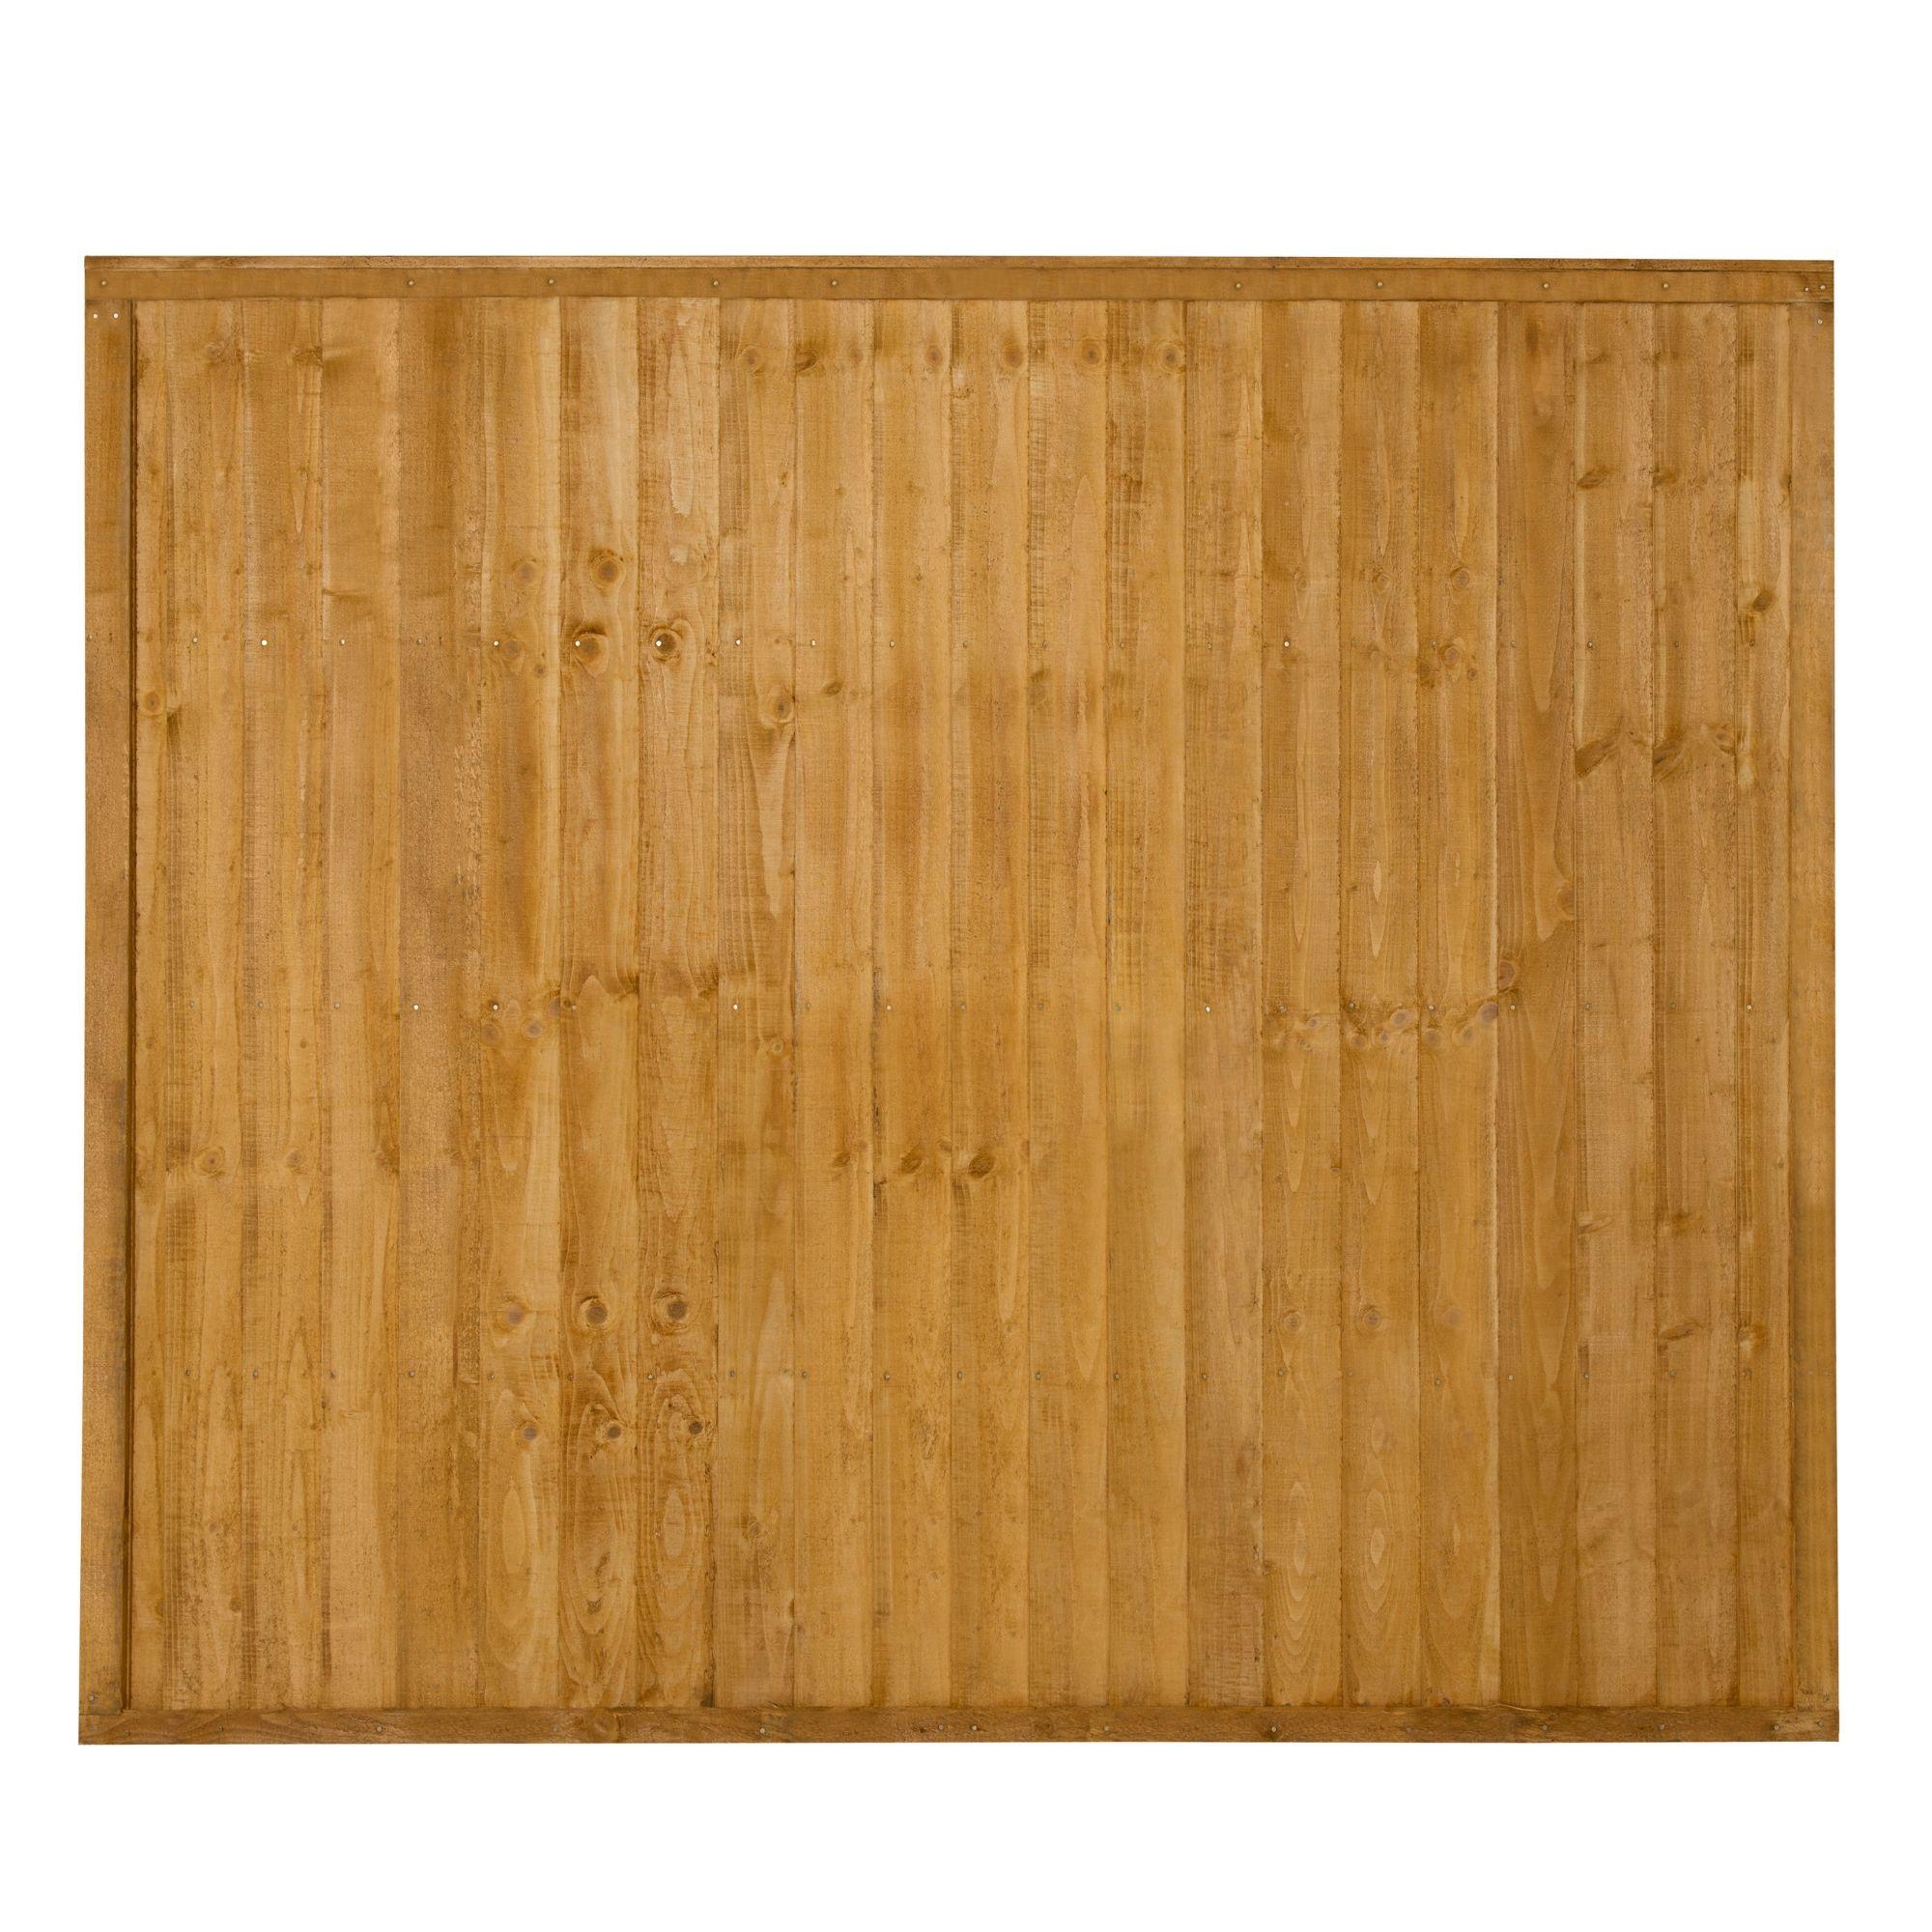 Closeboard Fence Panel W 1 83m H 1 52m Departments Diy At B Q